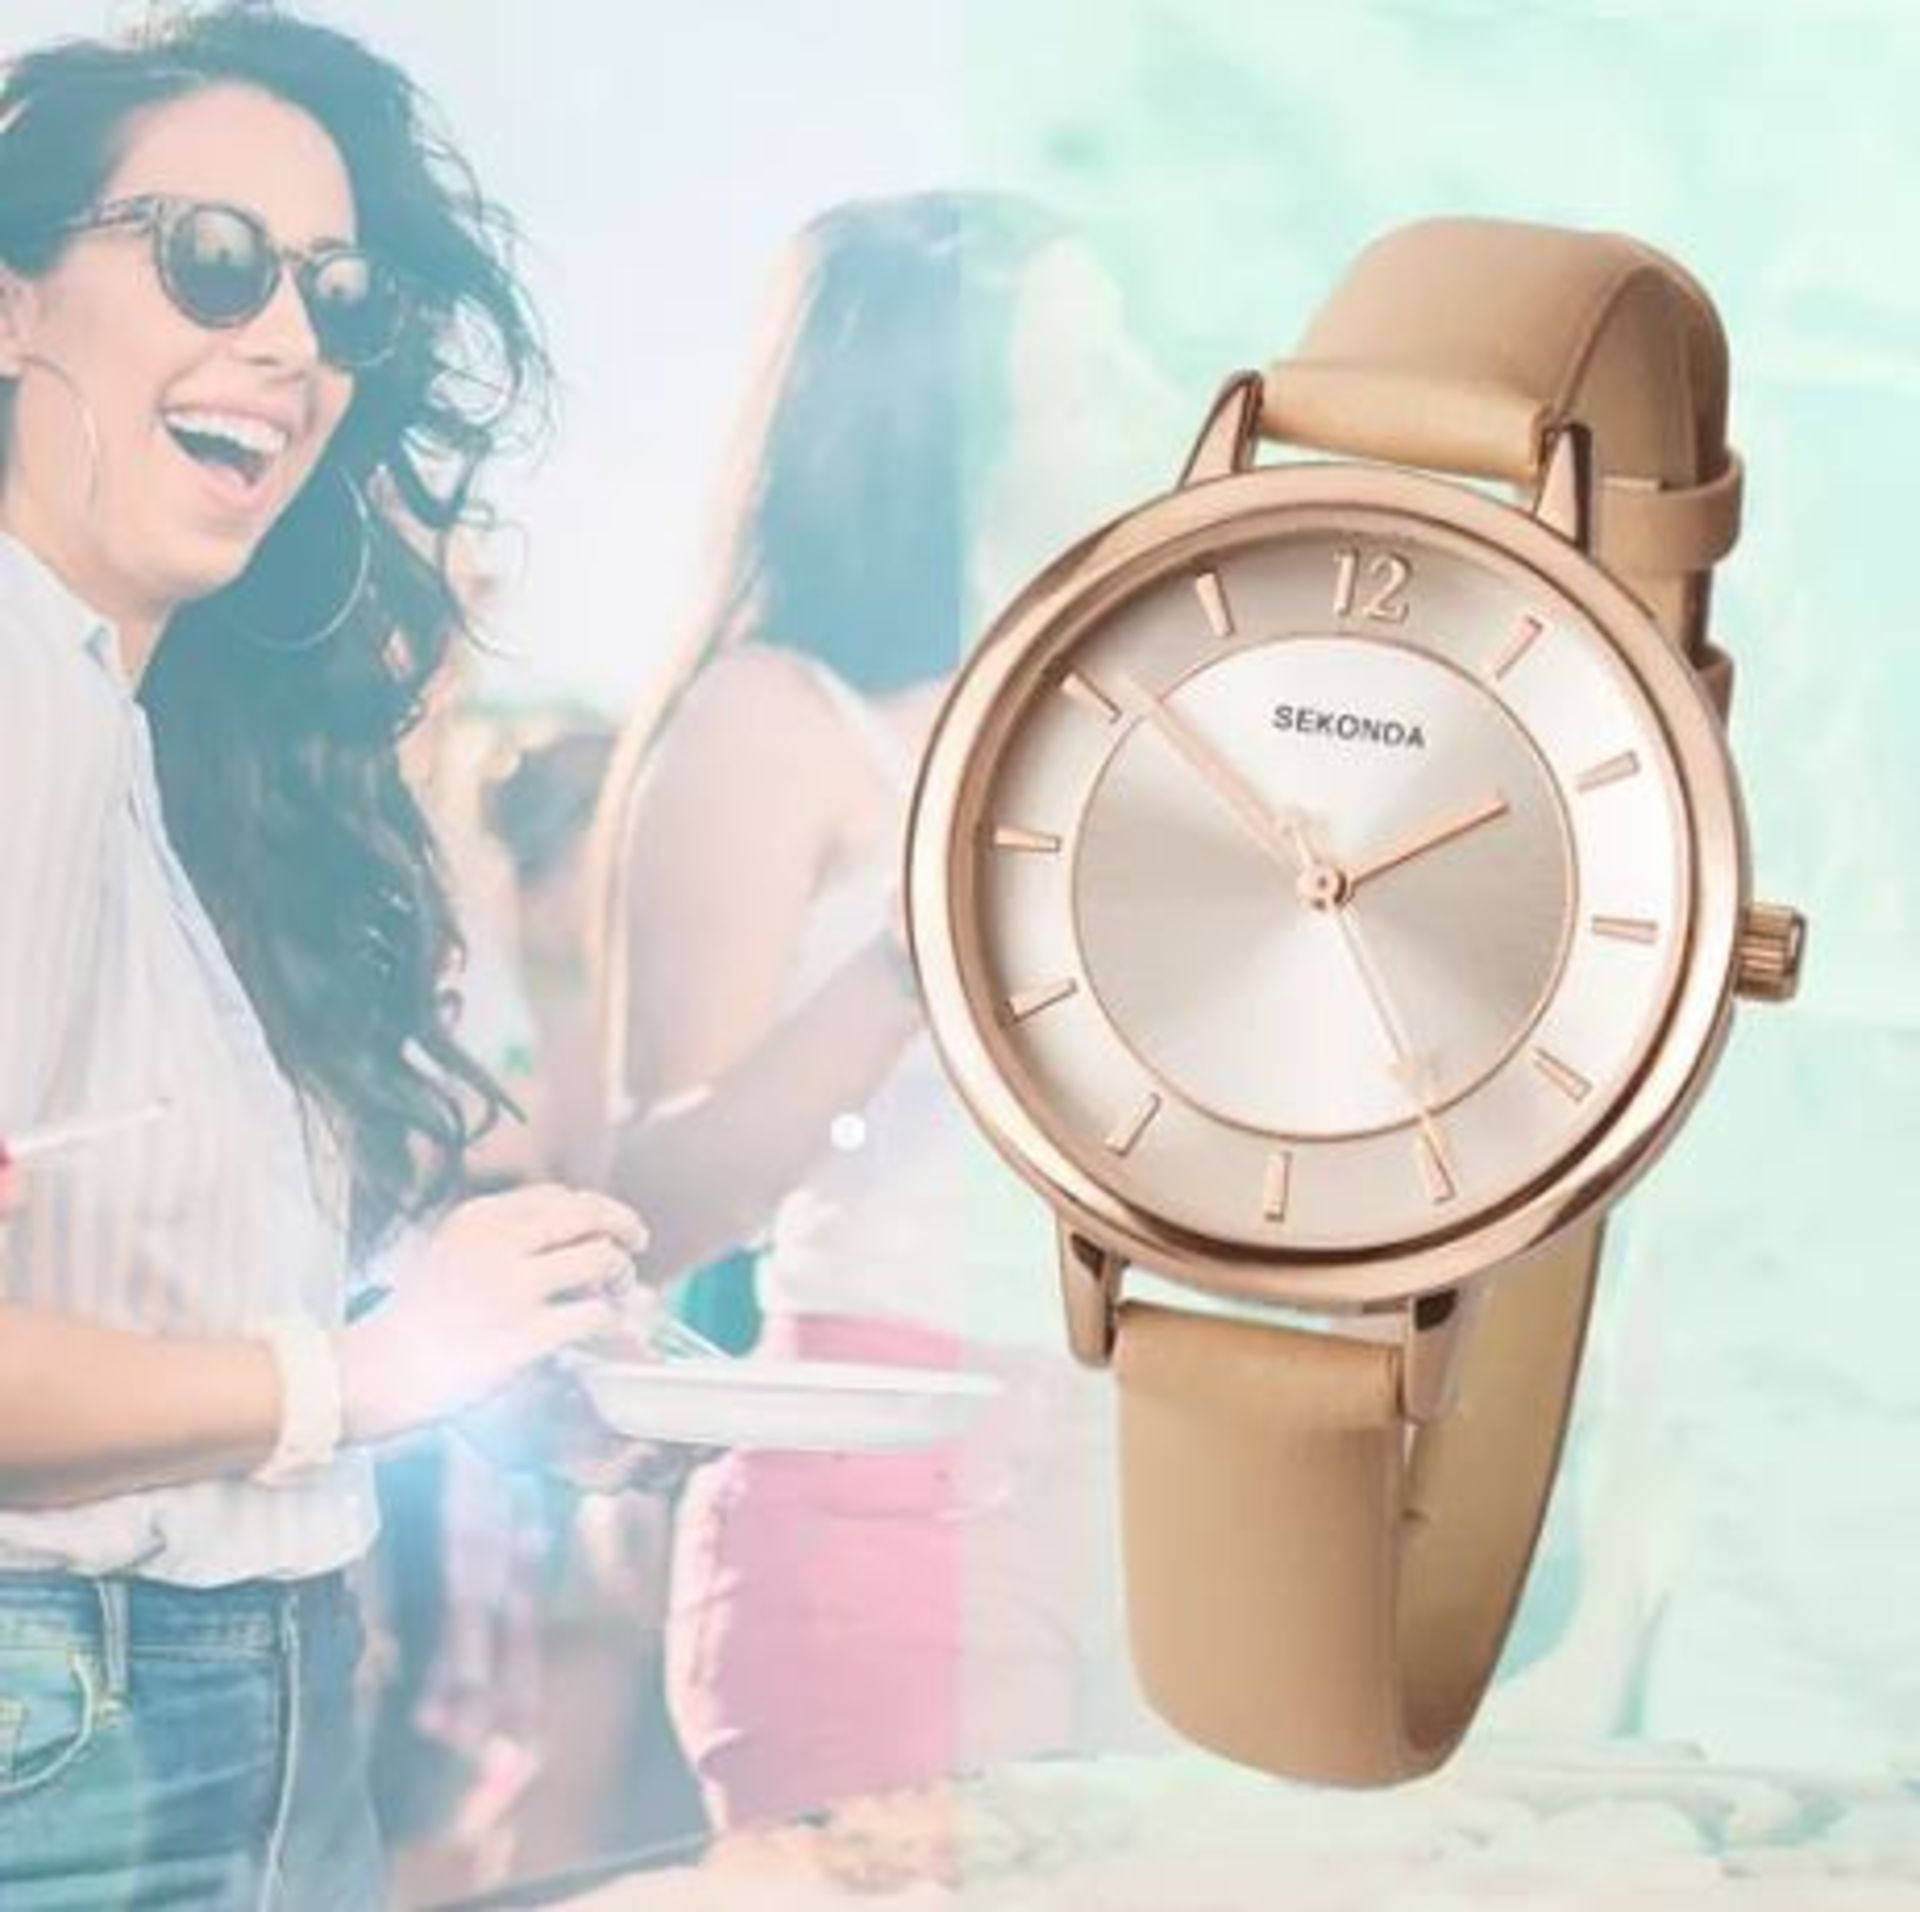 Lot 25 - Brand New Sekonda Women's Quartz Watch with Analogue Display 2137.28